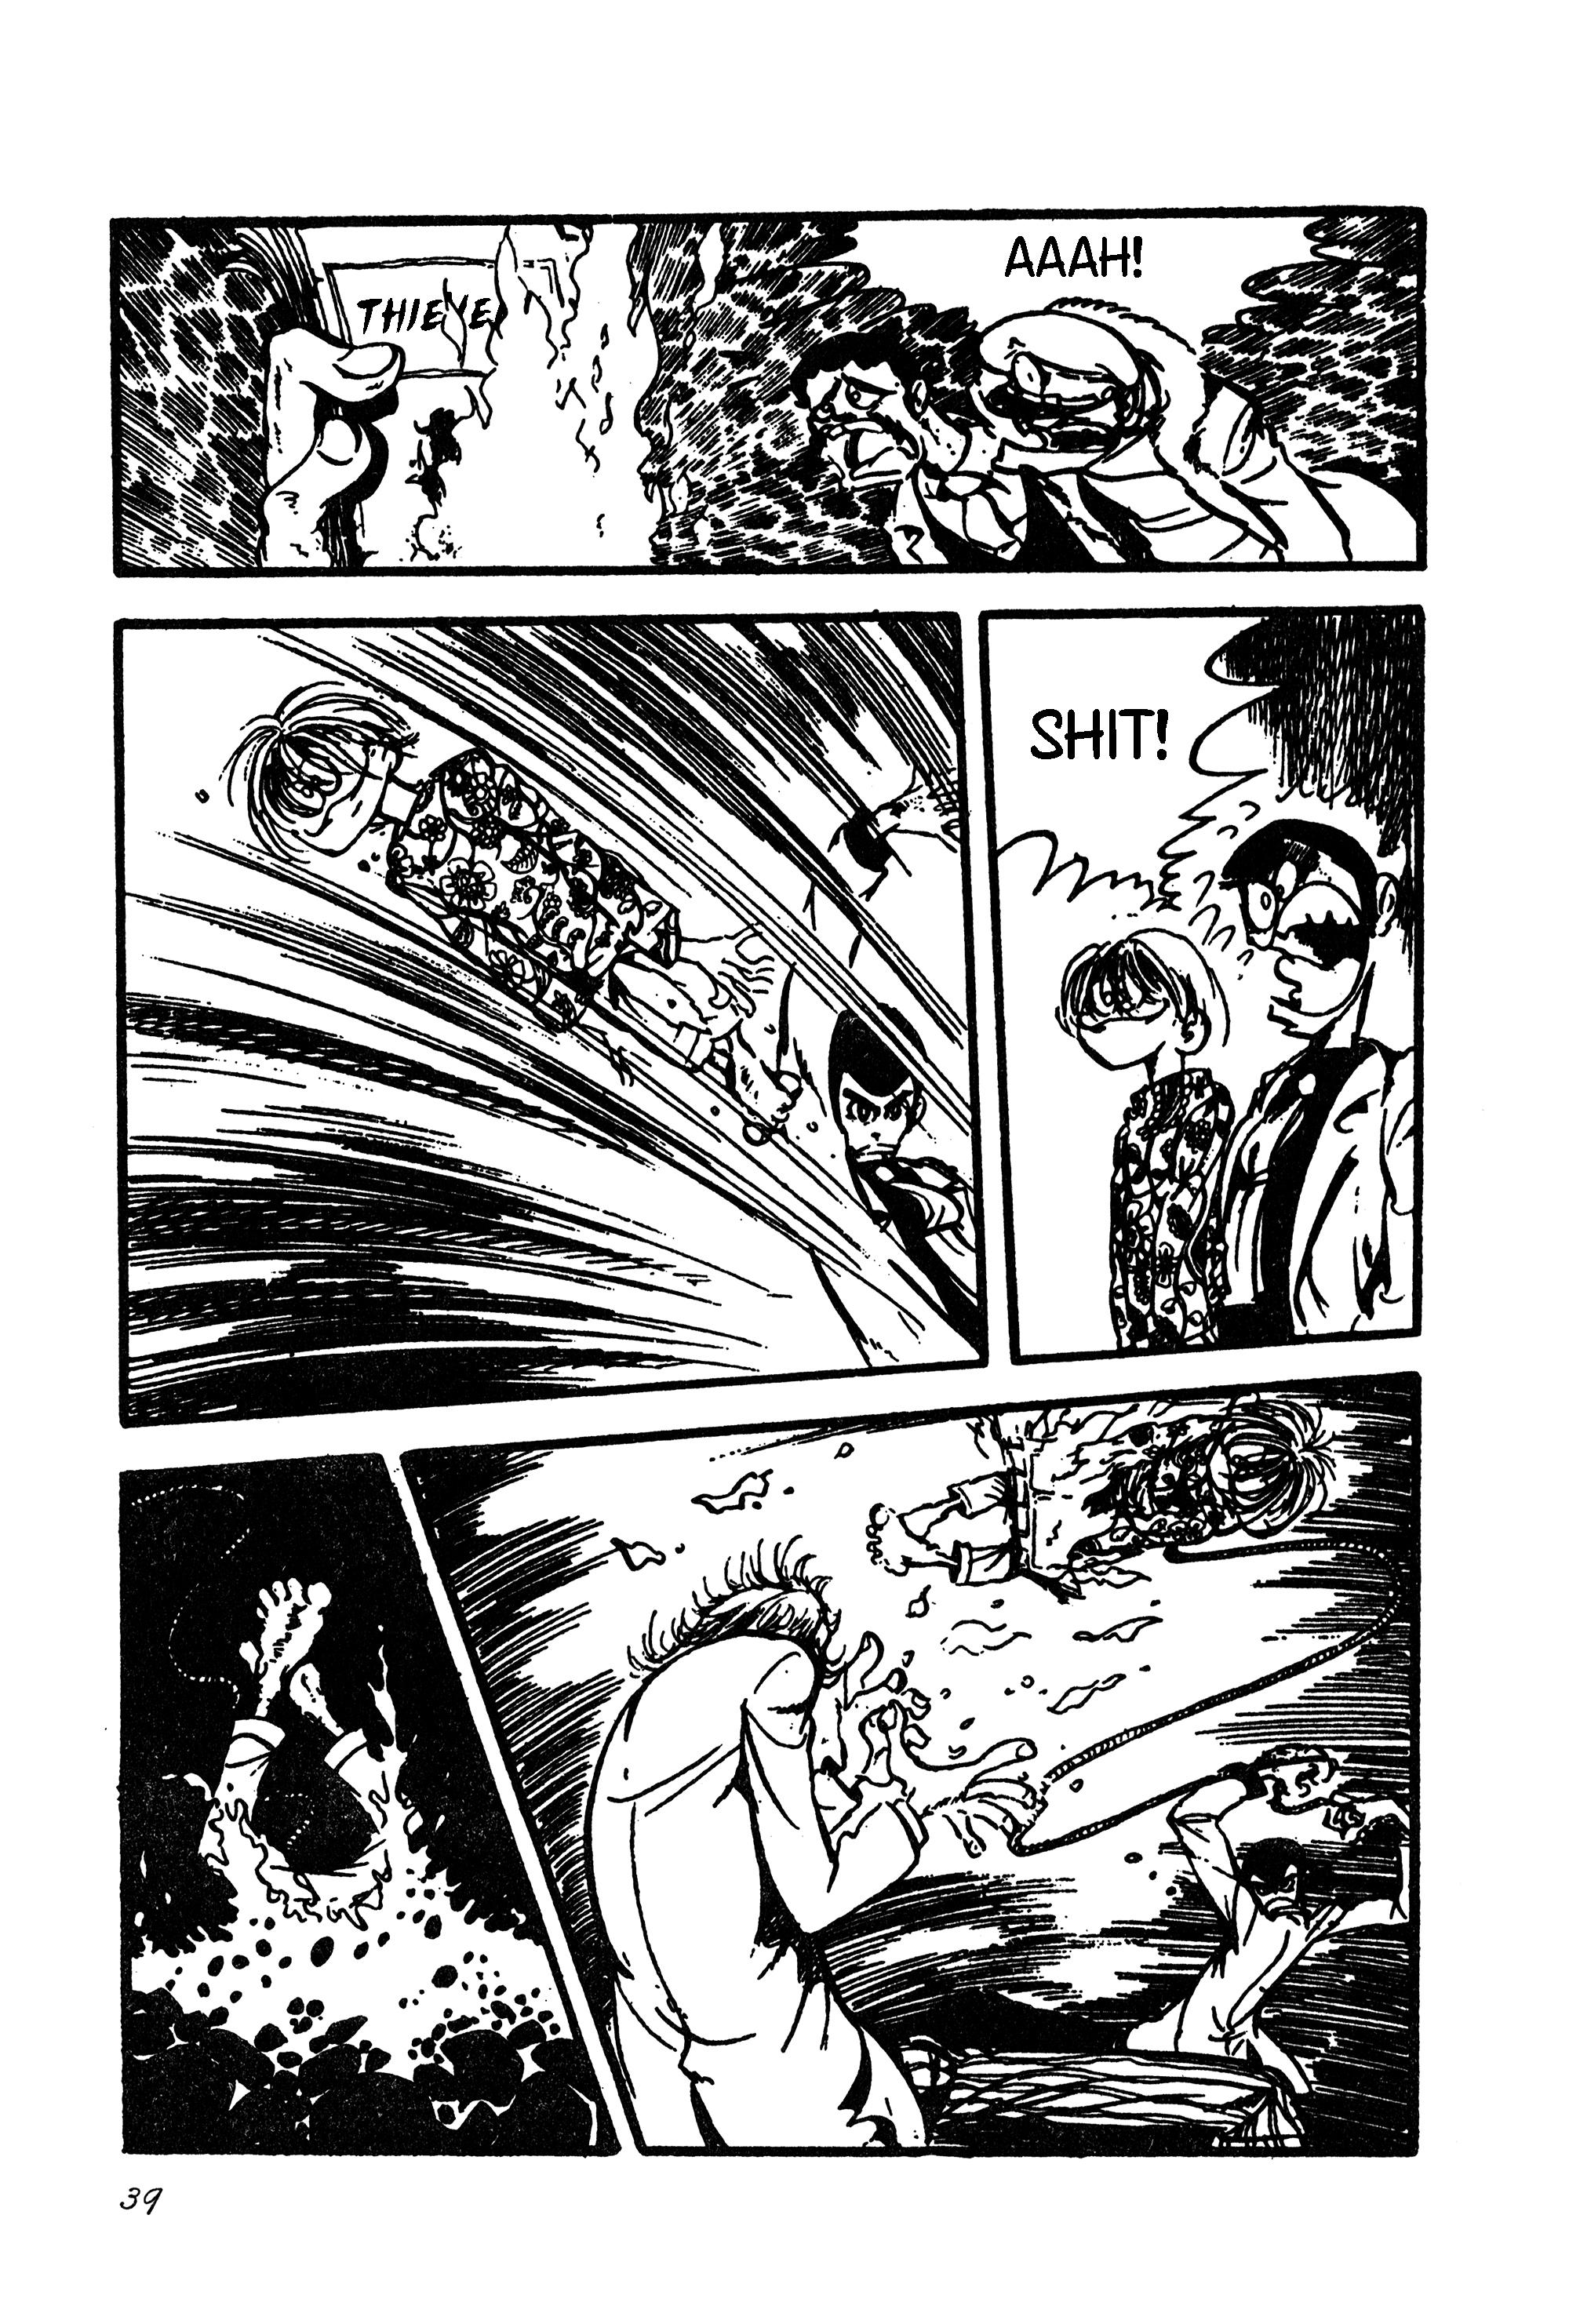 Lupin Iii Vol.9 Chapter 101: International Thievery Competition (Part 2) page 9 - Mangakakalots.com